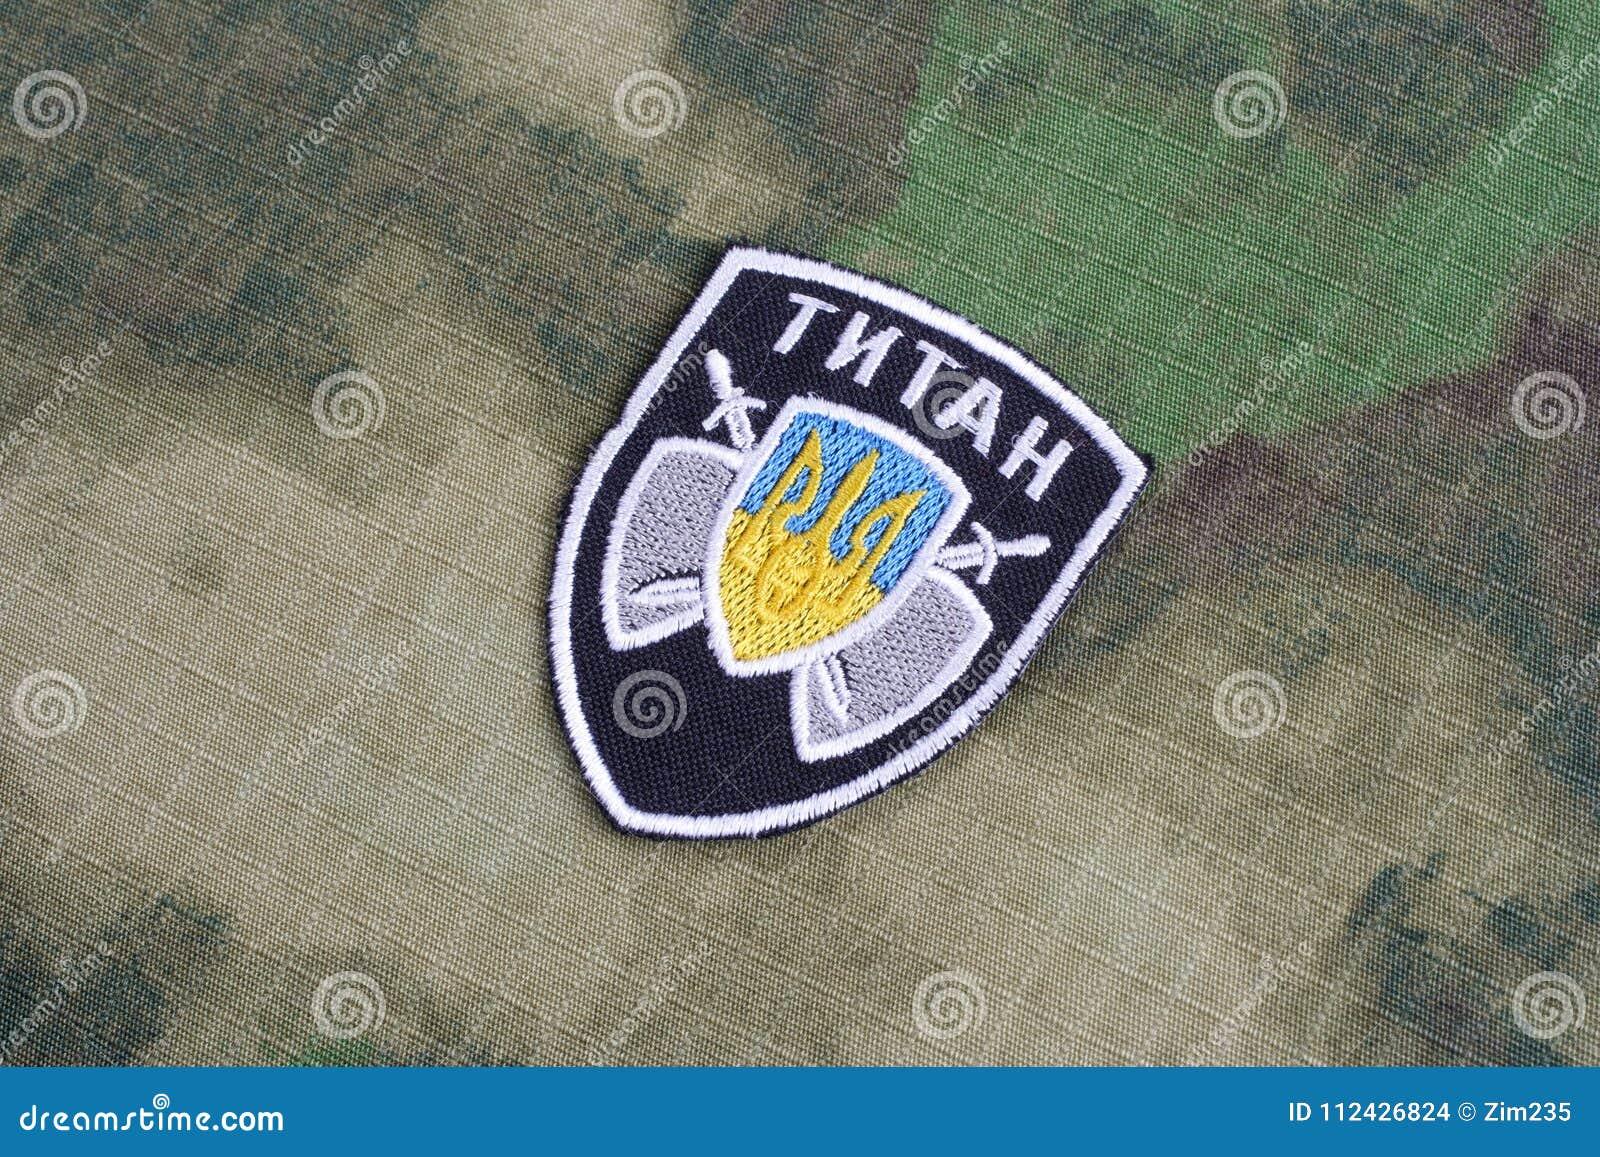 KIEV, UKRAINE - July, 16, 2015. Ministry of Internal Affairs (Ukraine) Titan uniform badge